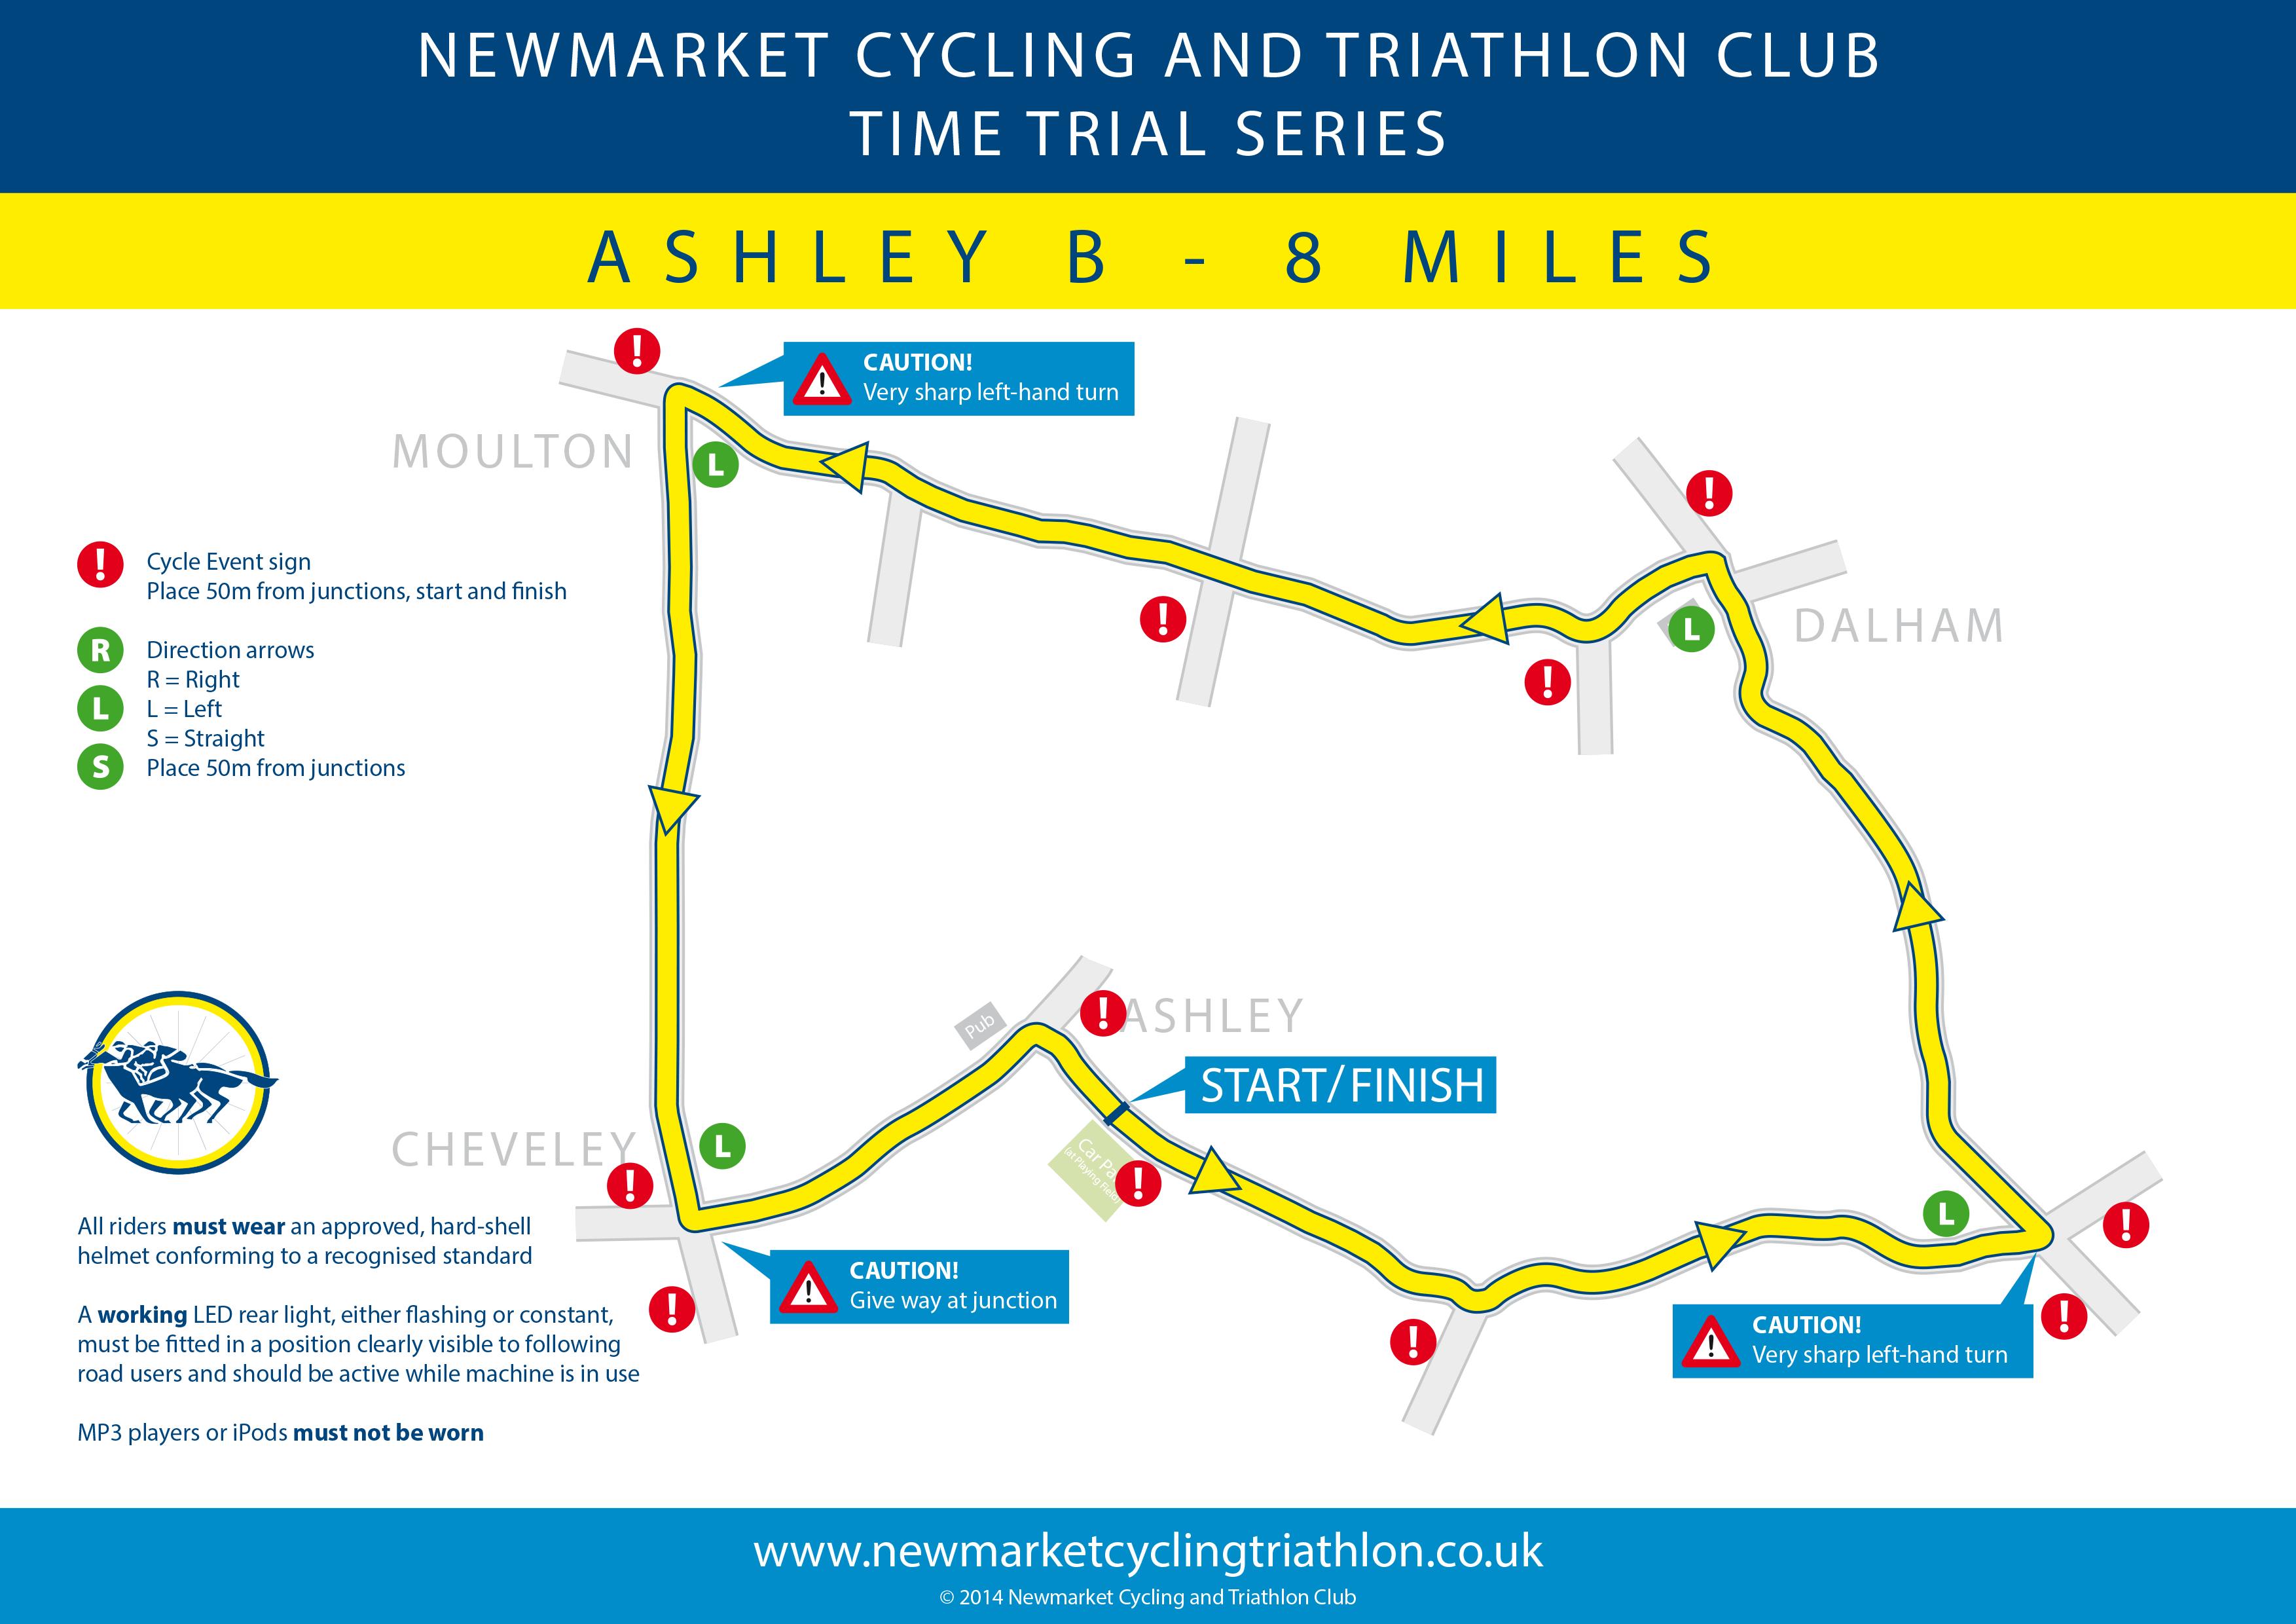 NCTC Ashley B TT route